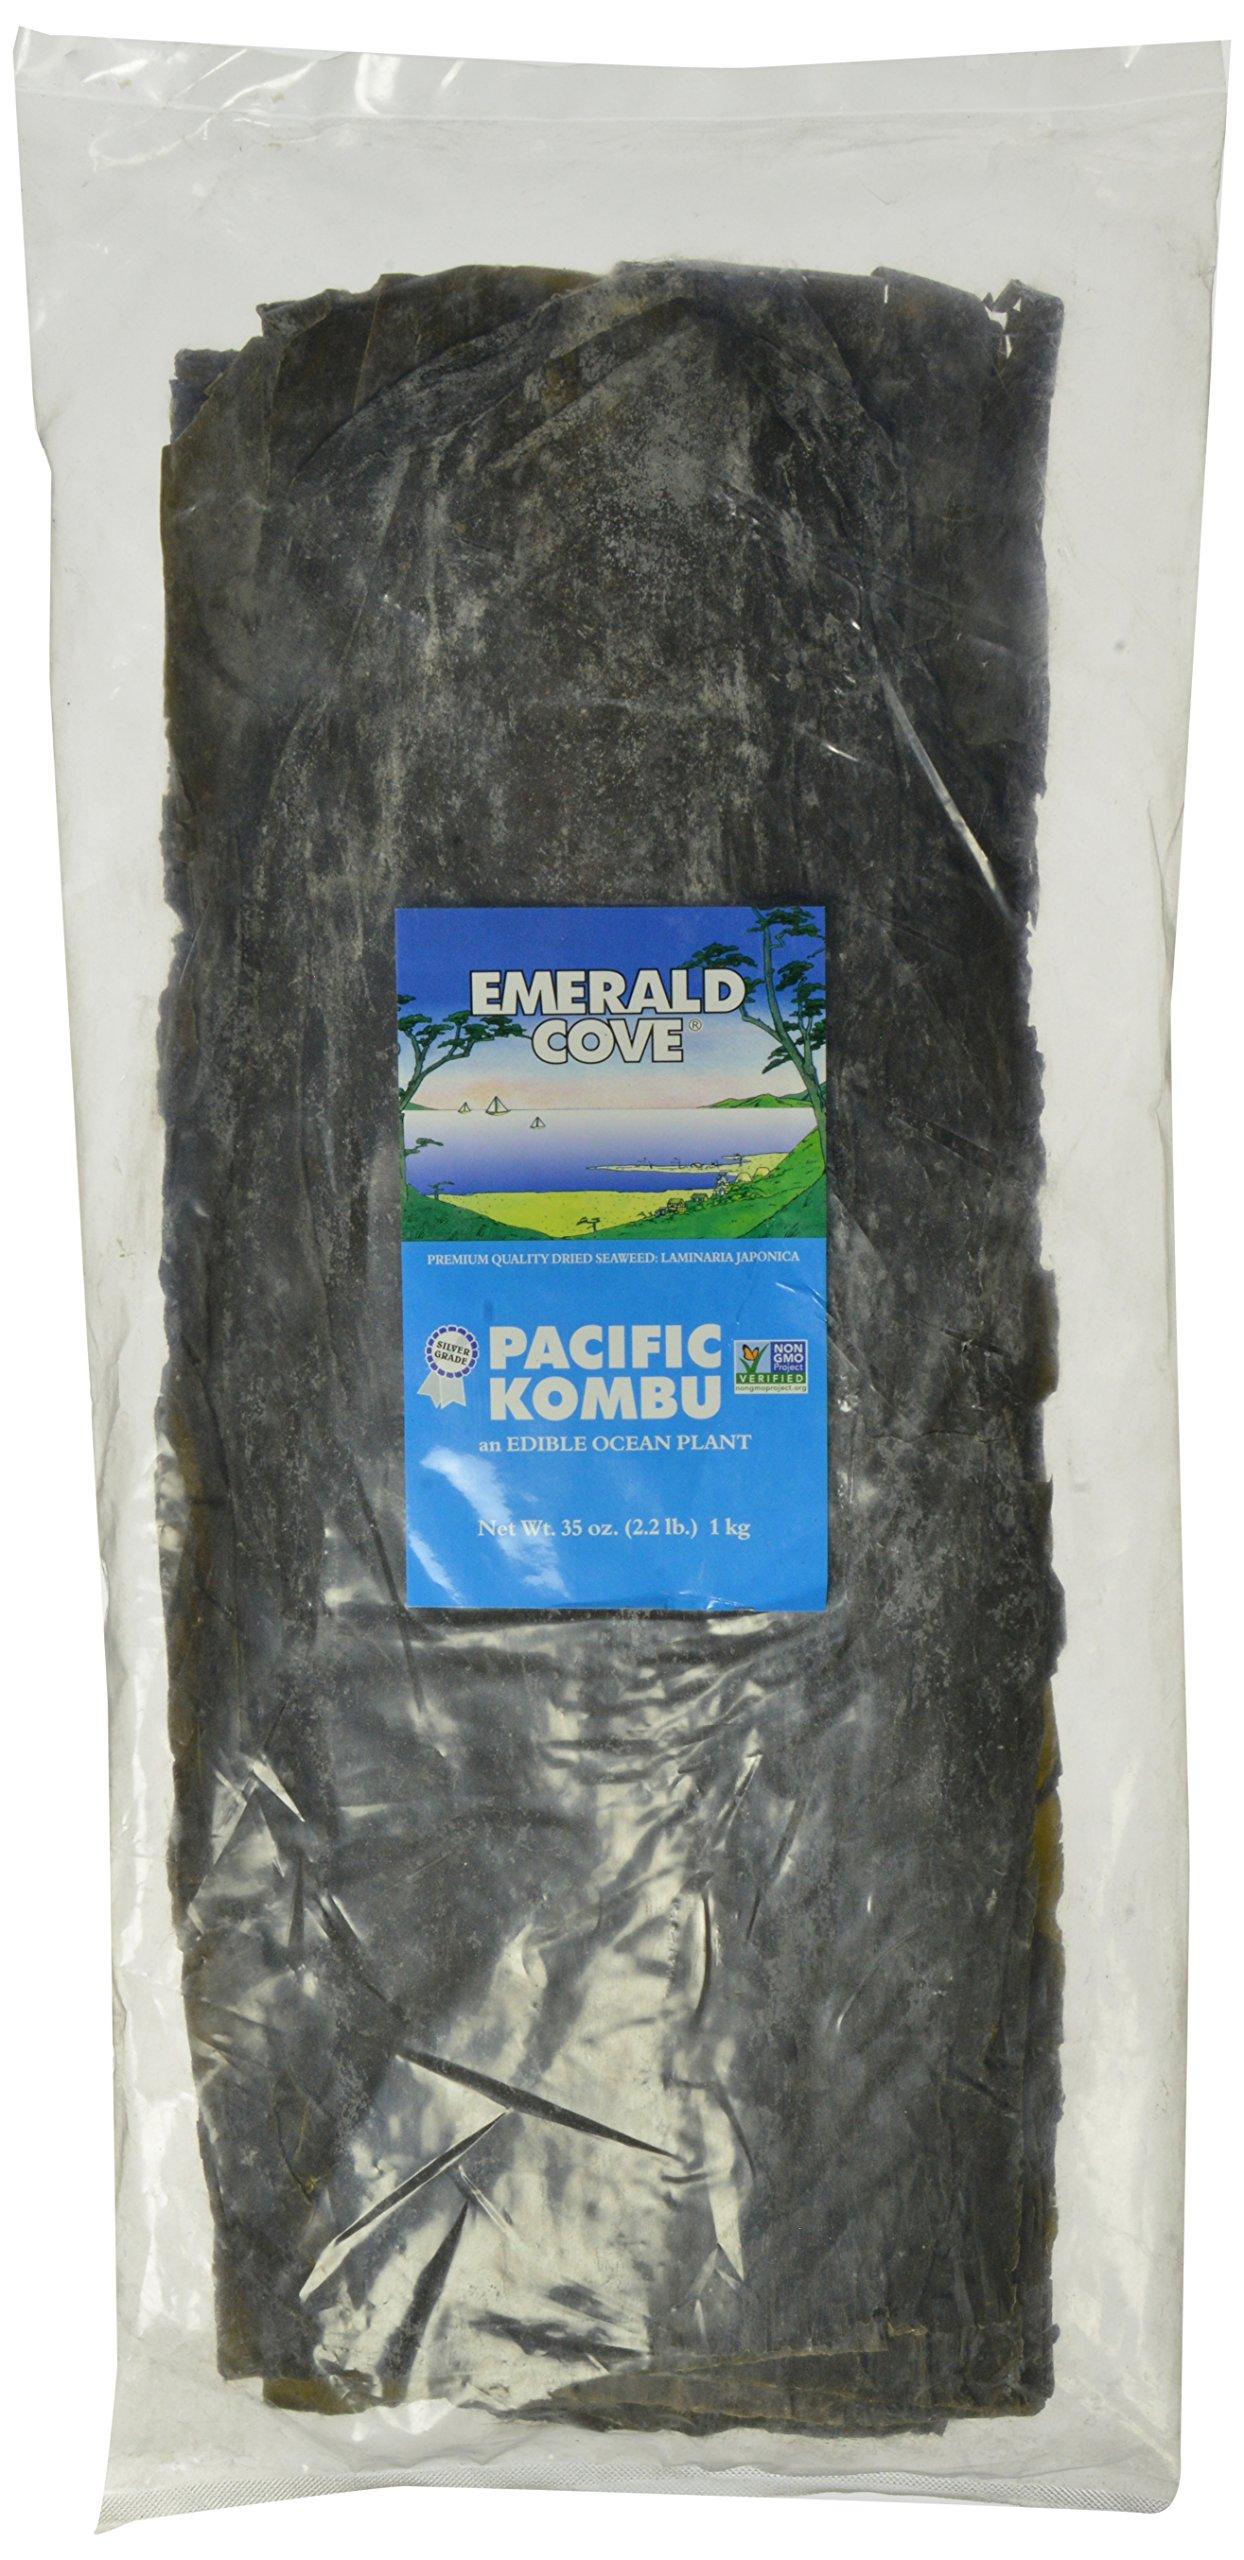 Emerald Cove Silver Grade Kombu (Dried Seaweed), 35-Ounce Bag